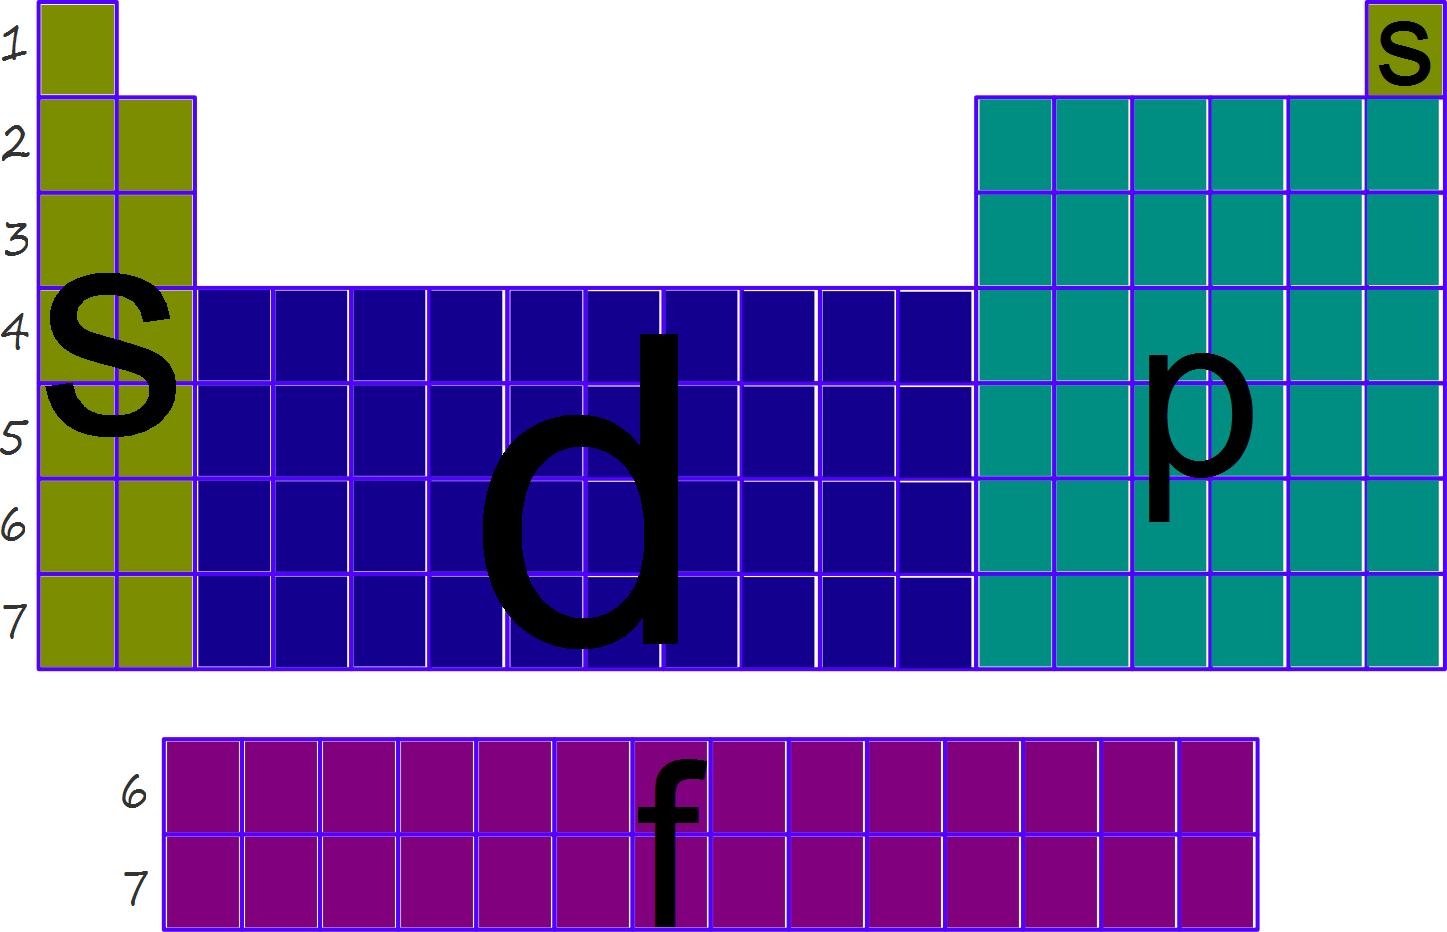 Tabla periodica grupos s p d f image collections periodic table tabla periodica en bloques s p d f image collections periodic un acercamiento a la quimica bloque ii el urtaz Choice Image